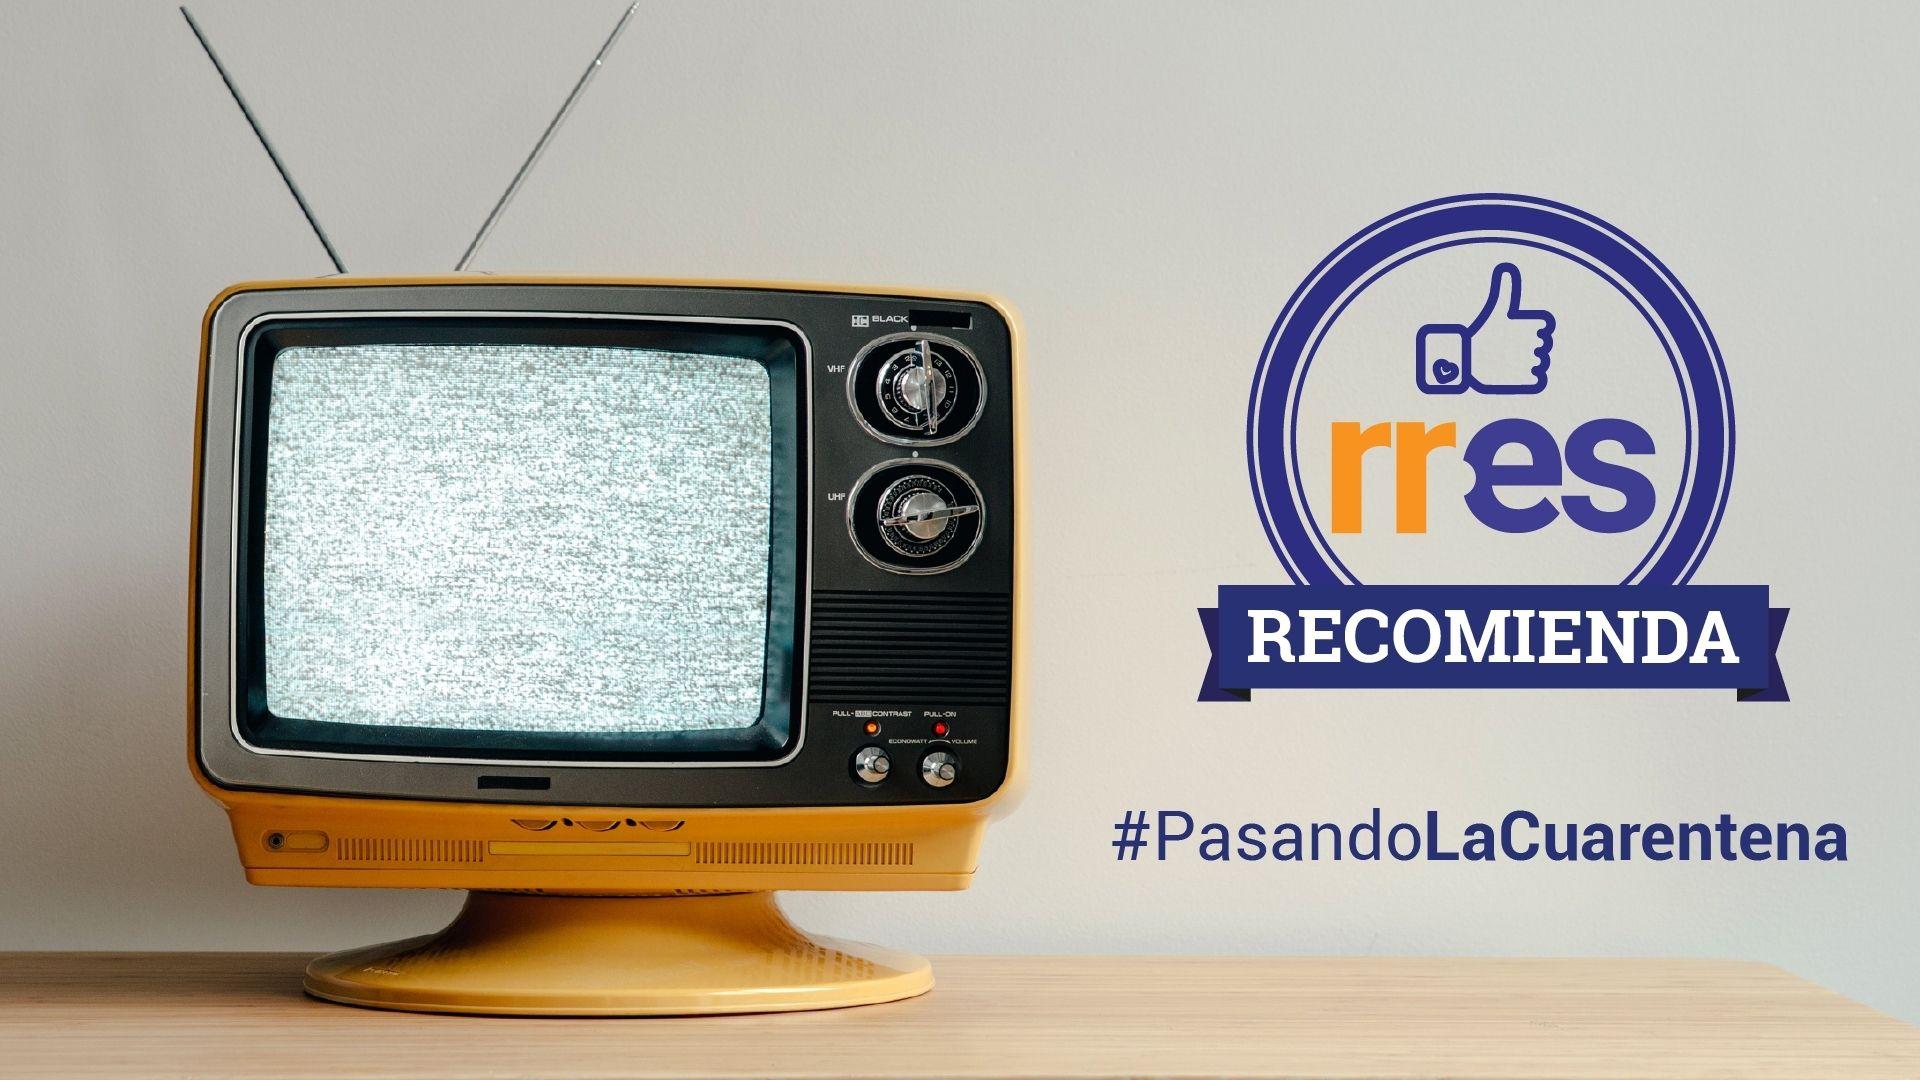 #PasandoLaCuarentena | Jueves de TBT: Comerciales venezolanos para los nostálgicos